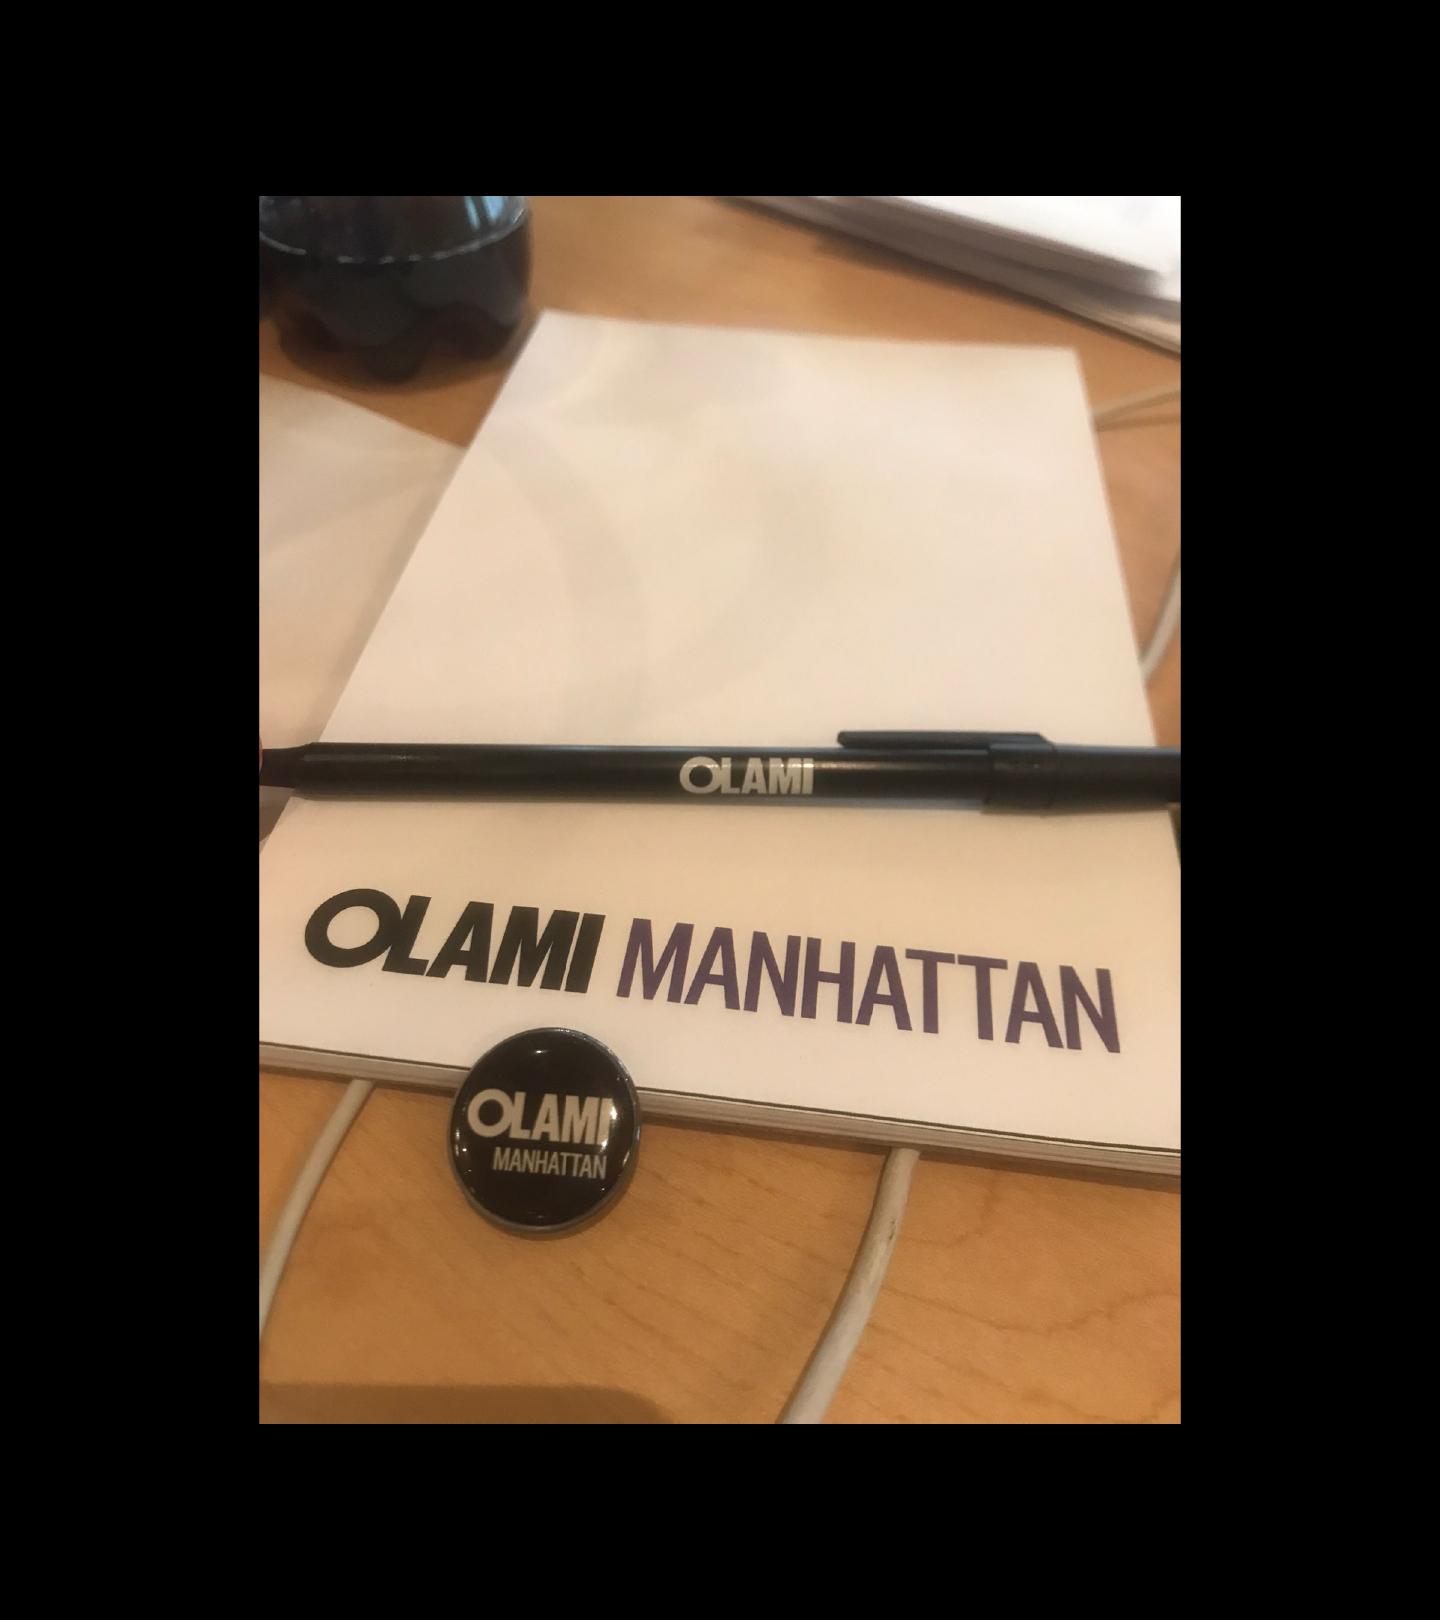 Olami-1-copy-5j